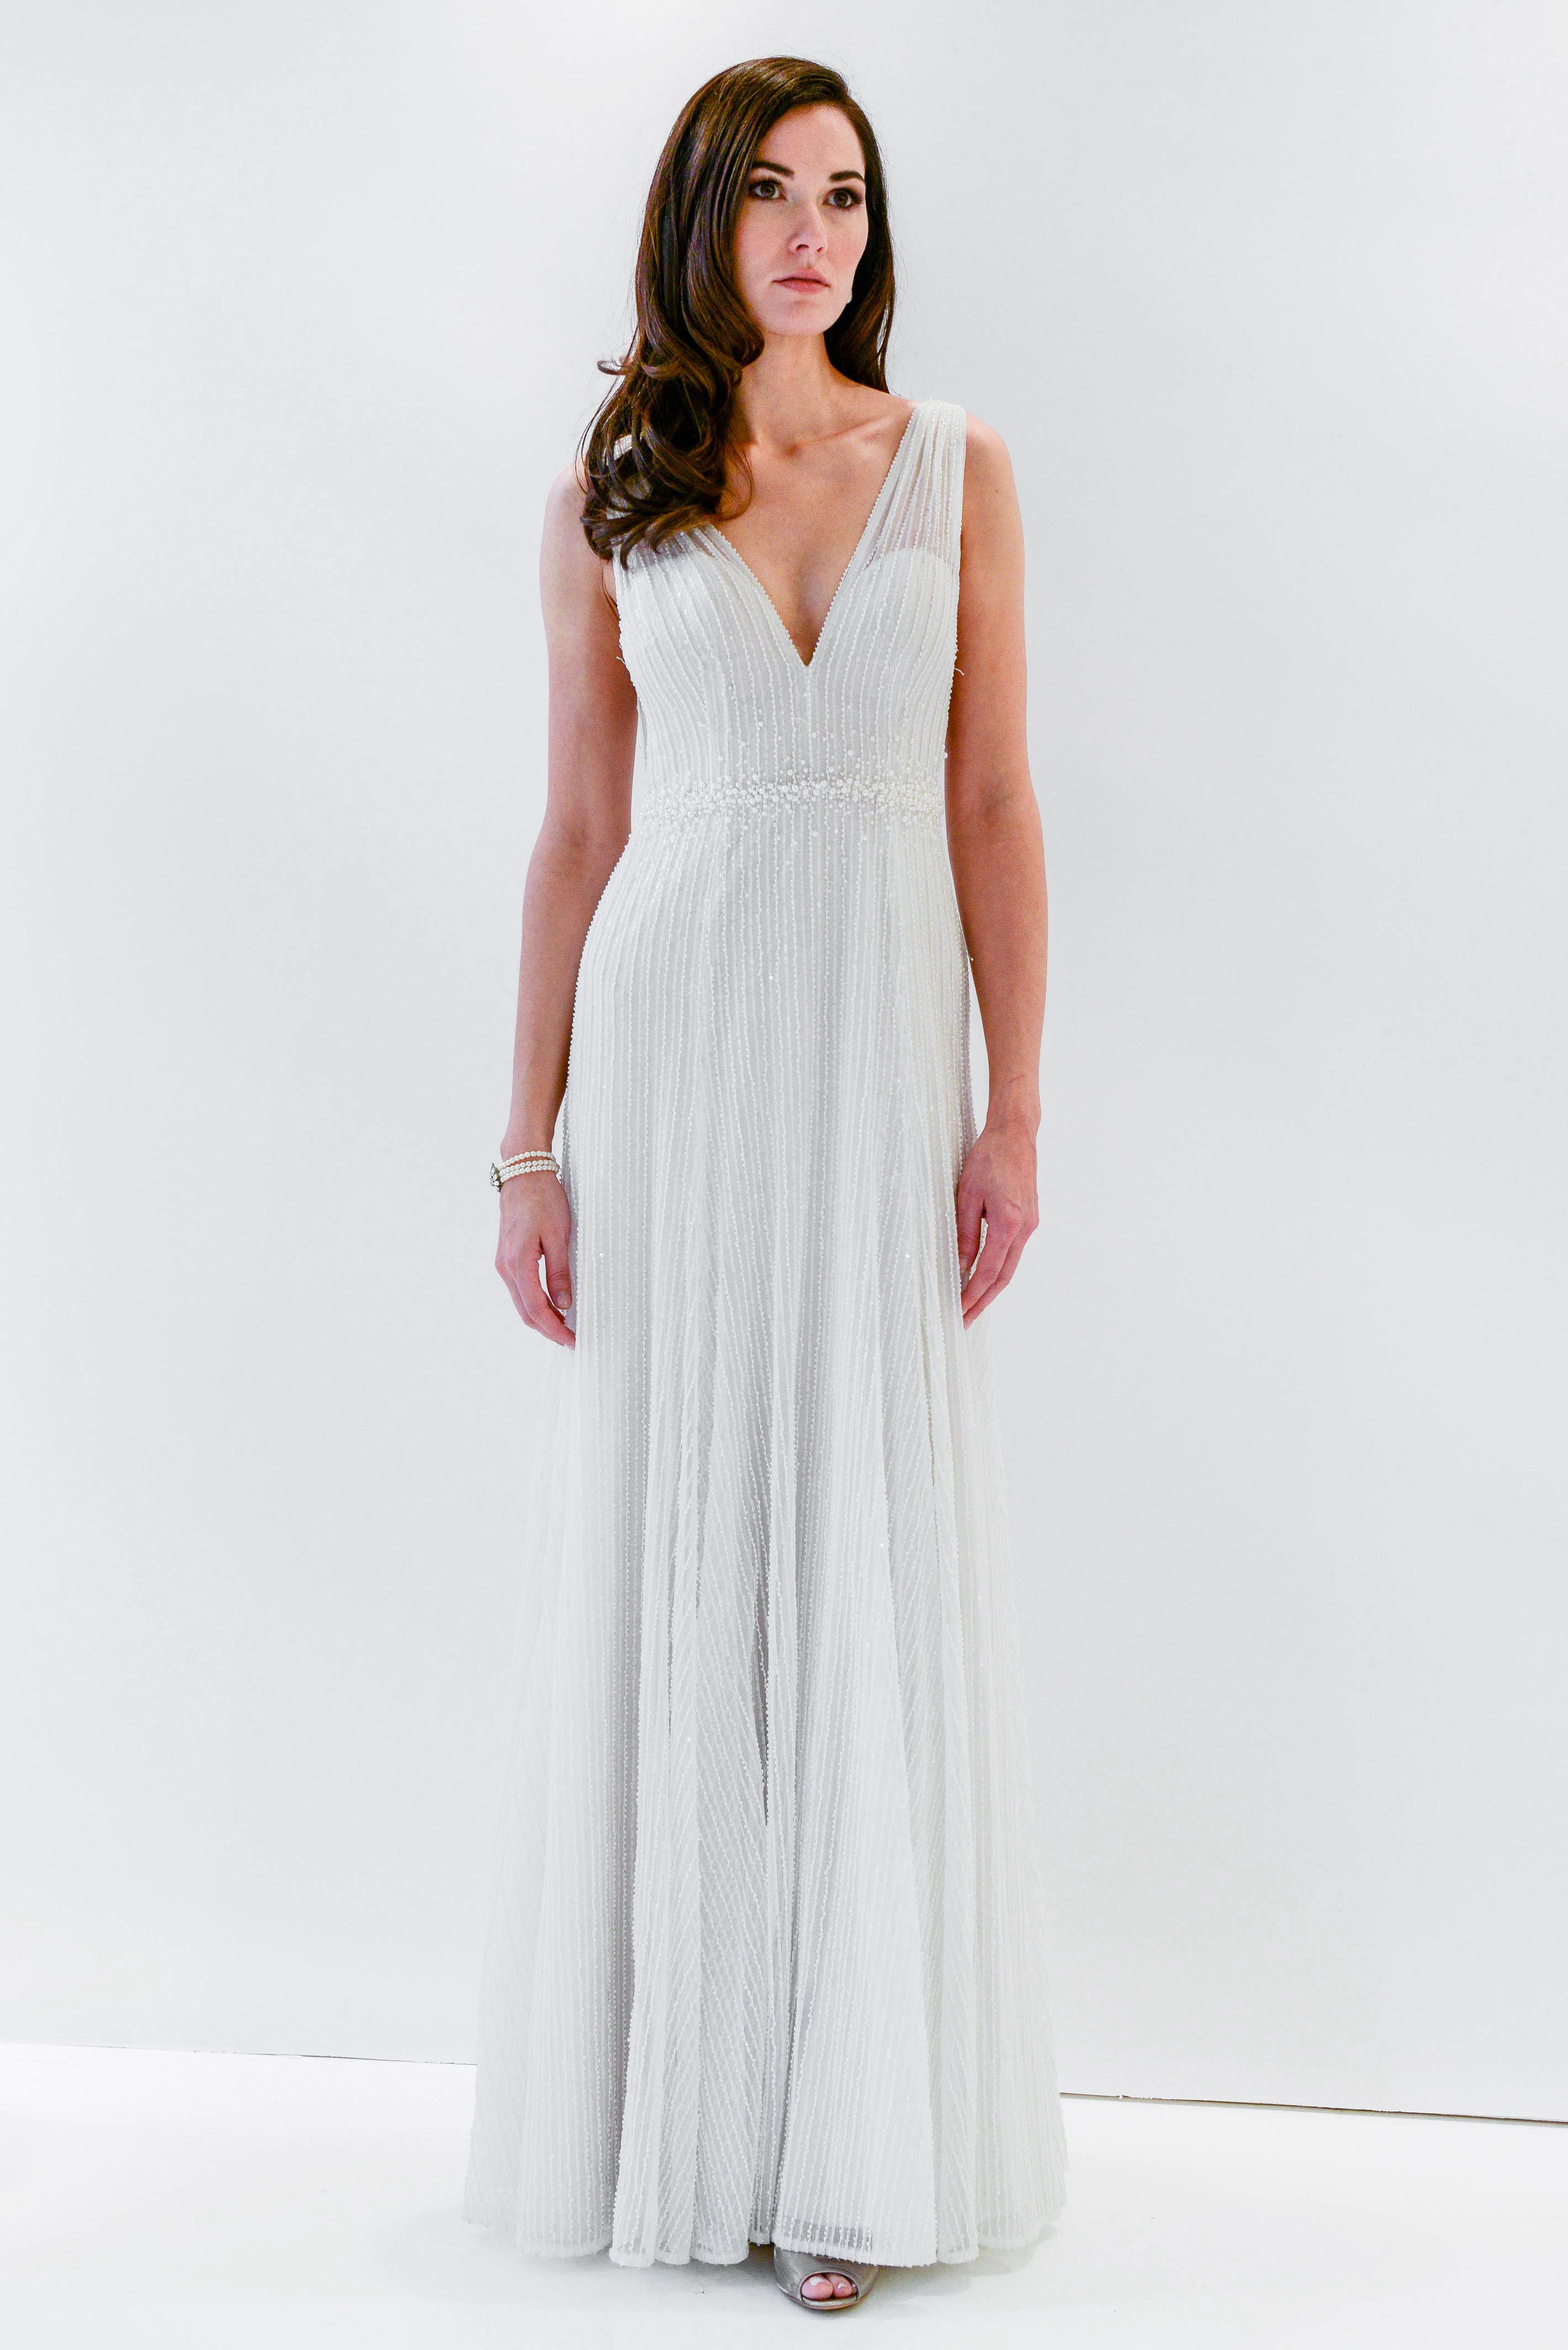 watters wtoo v-neck beaded wedding dress spring 2018